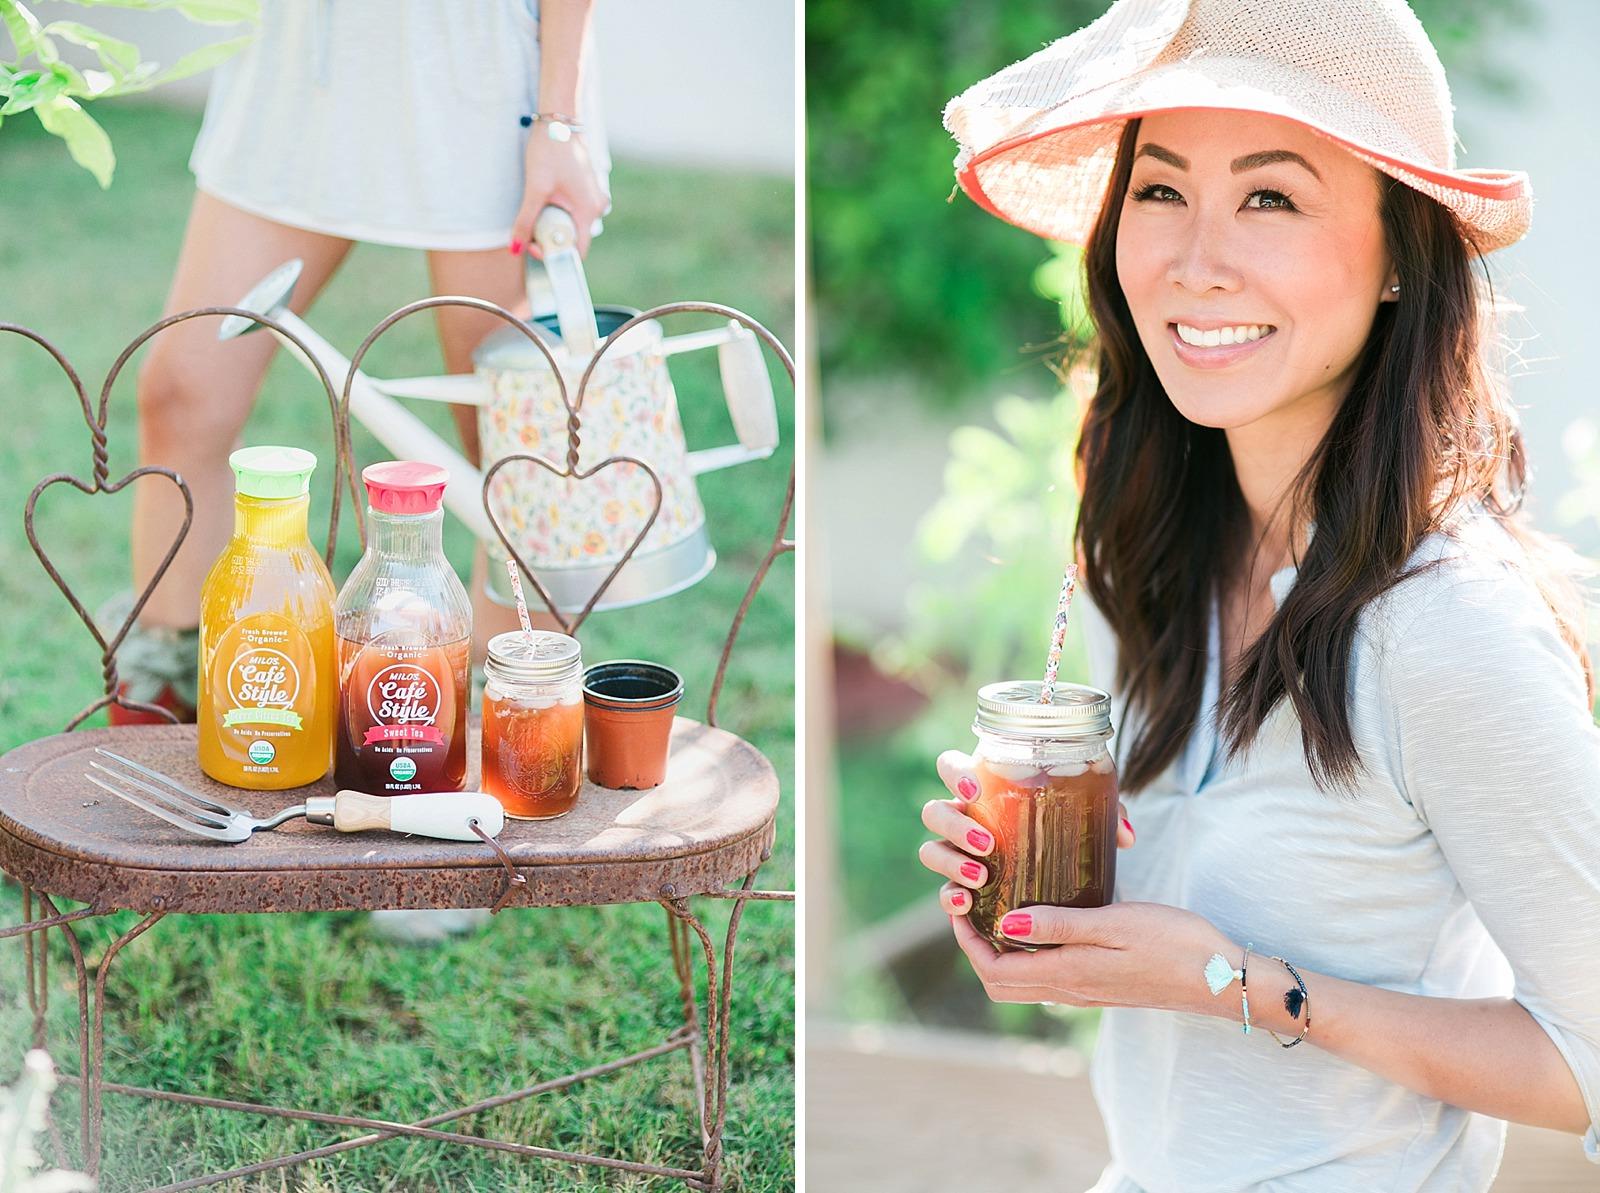 milo-iced-tea-gardening-lifestyle-blogger-diana-elizabeth-blog_0057